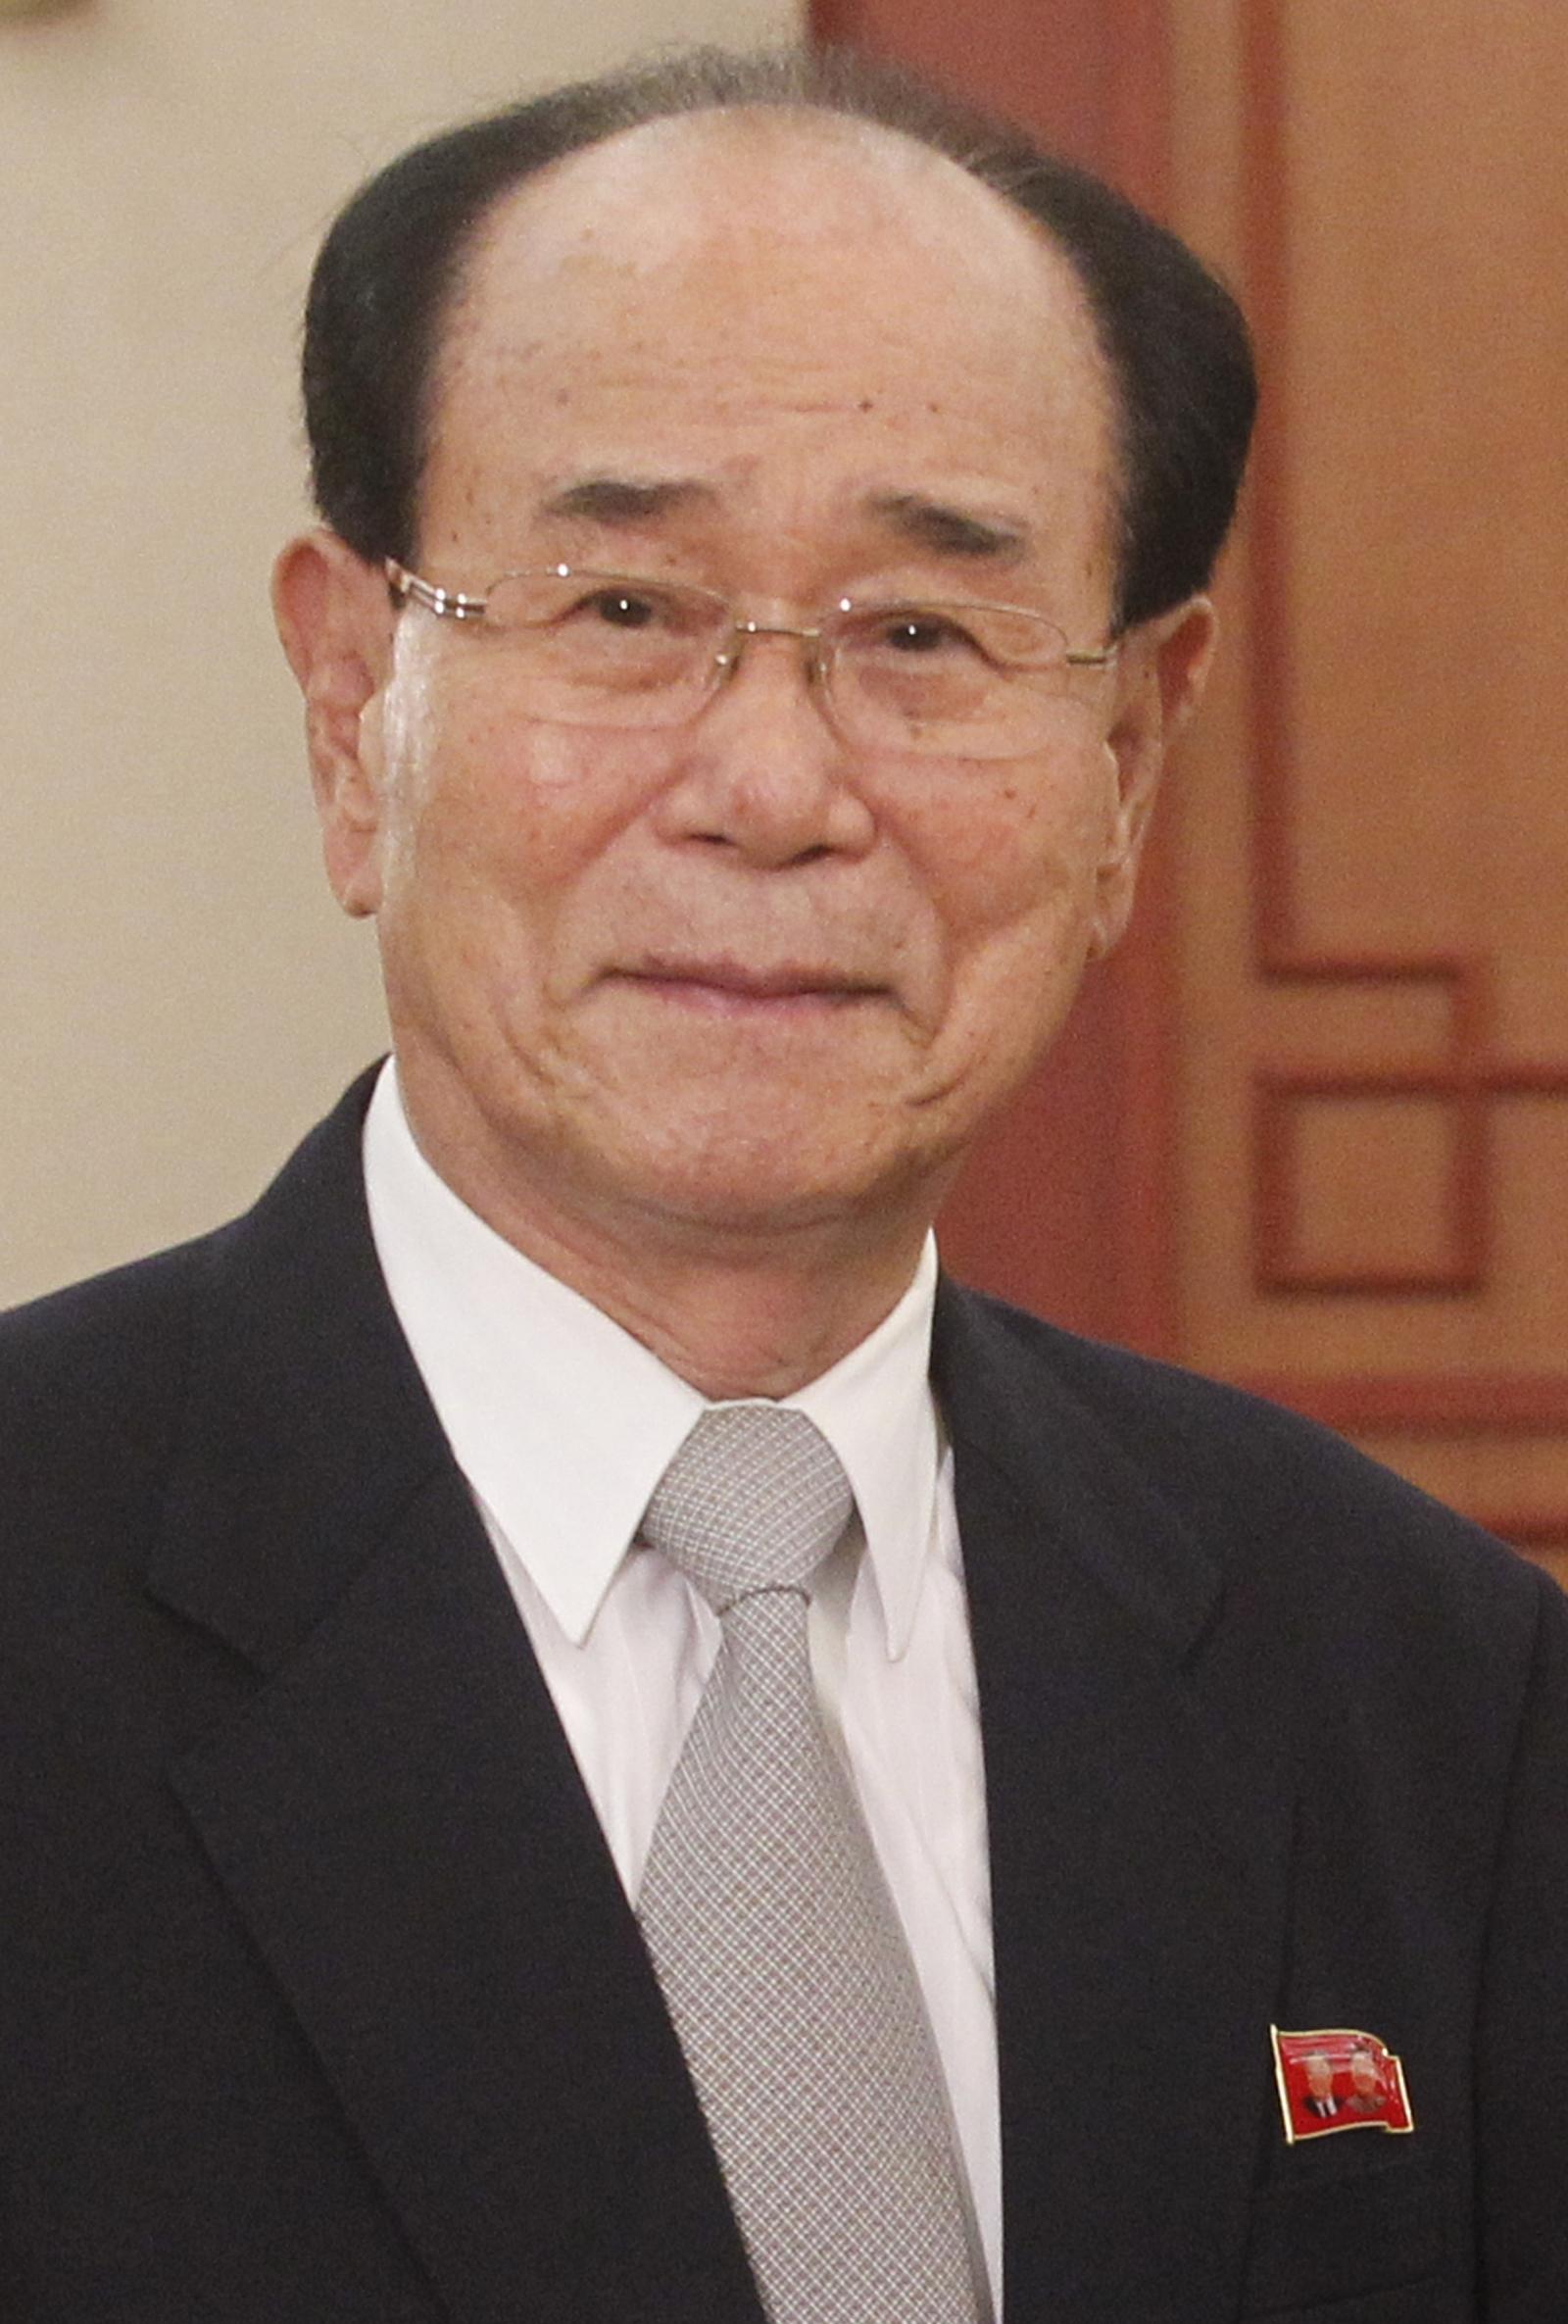 North Korea ceremonial head of state